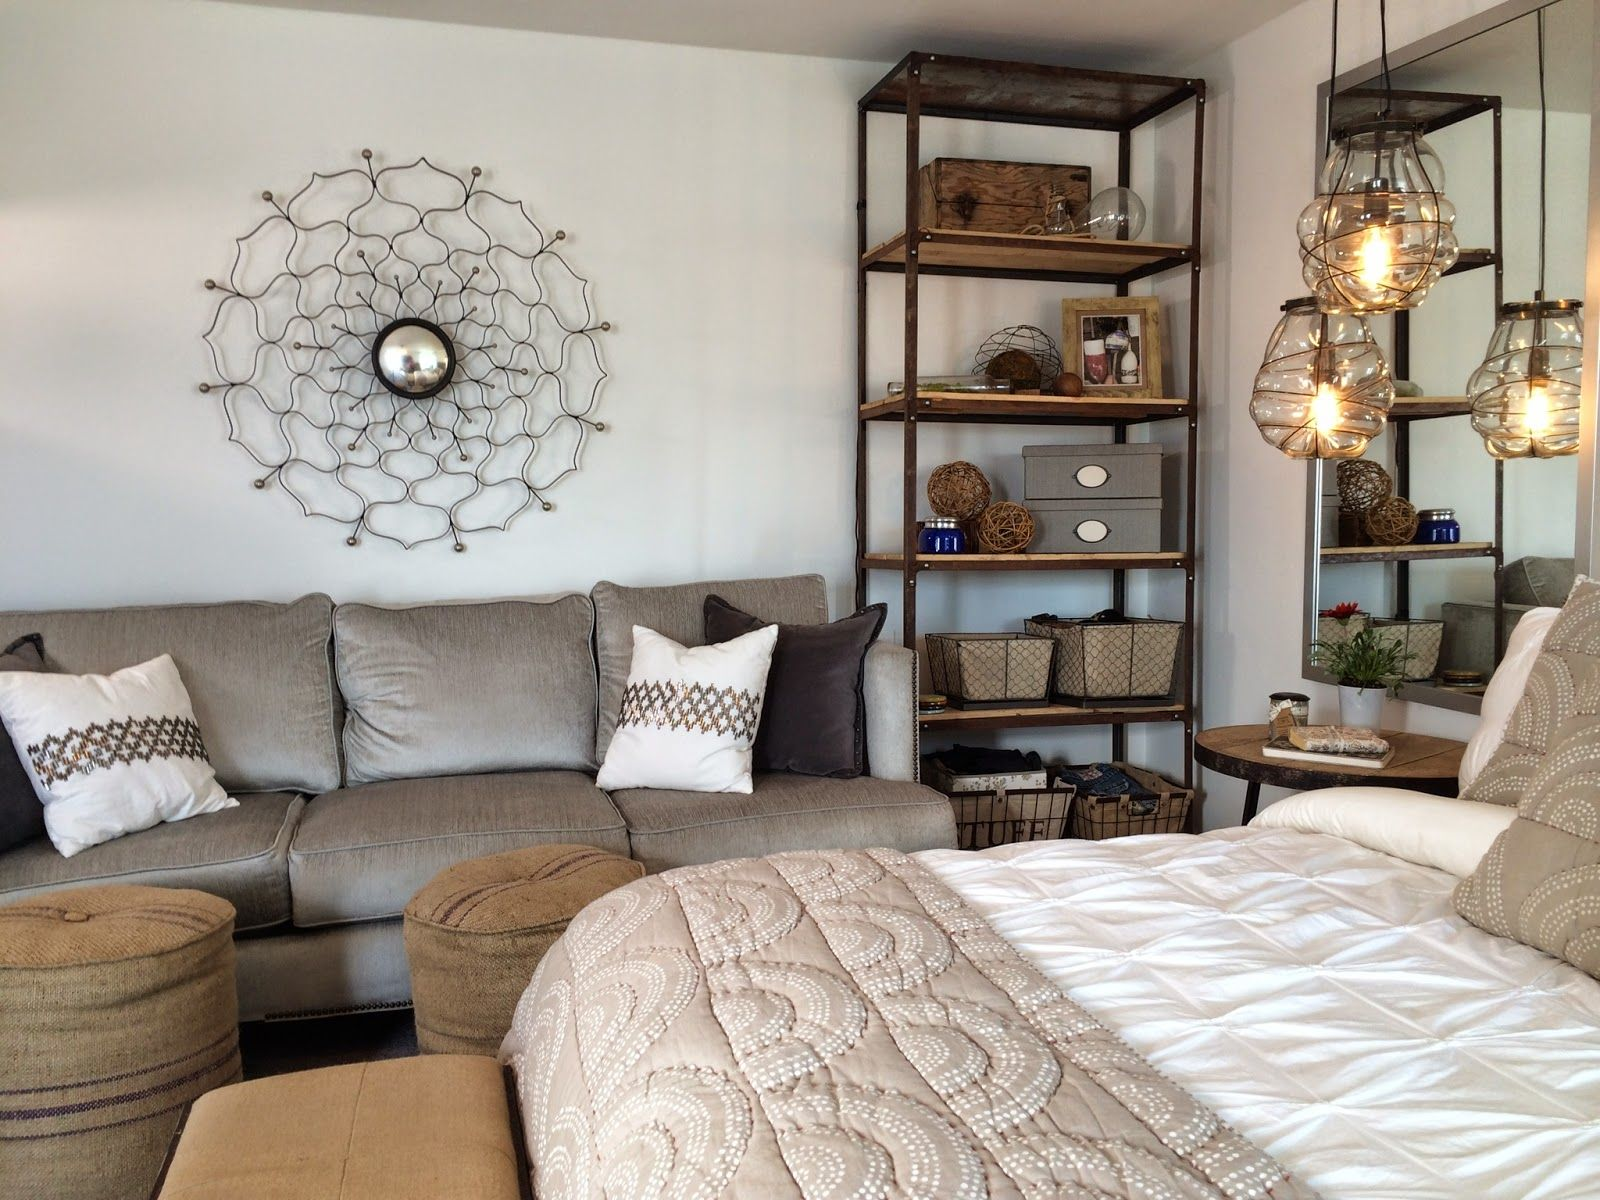 House, Home, Apartment Decor: Studio / Bachelorette   Feminine Decor ...